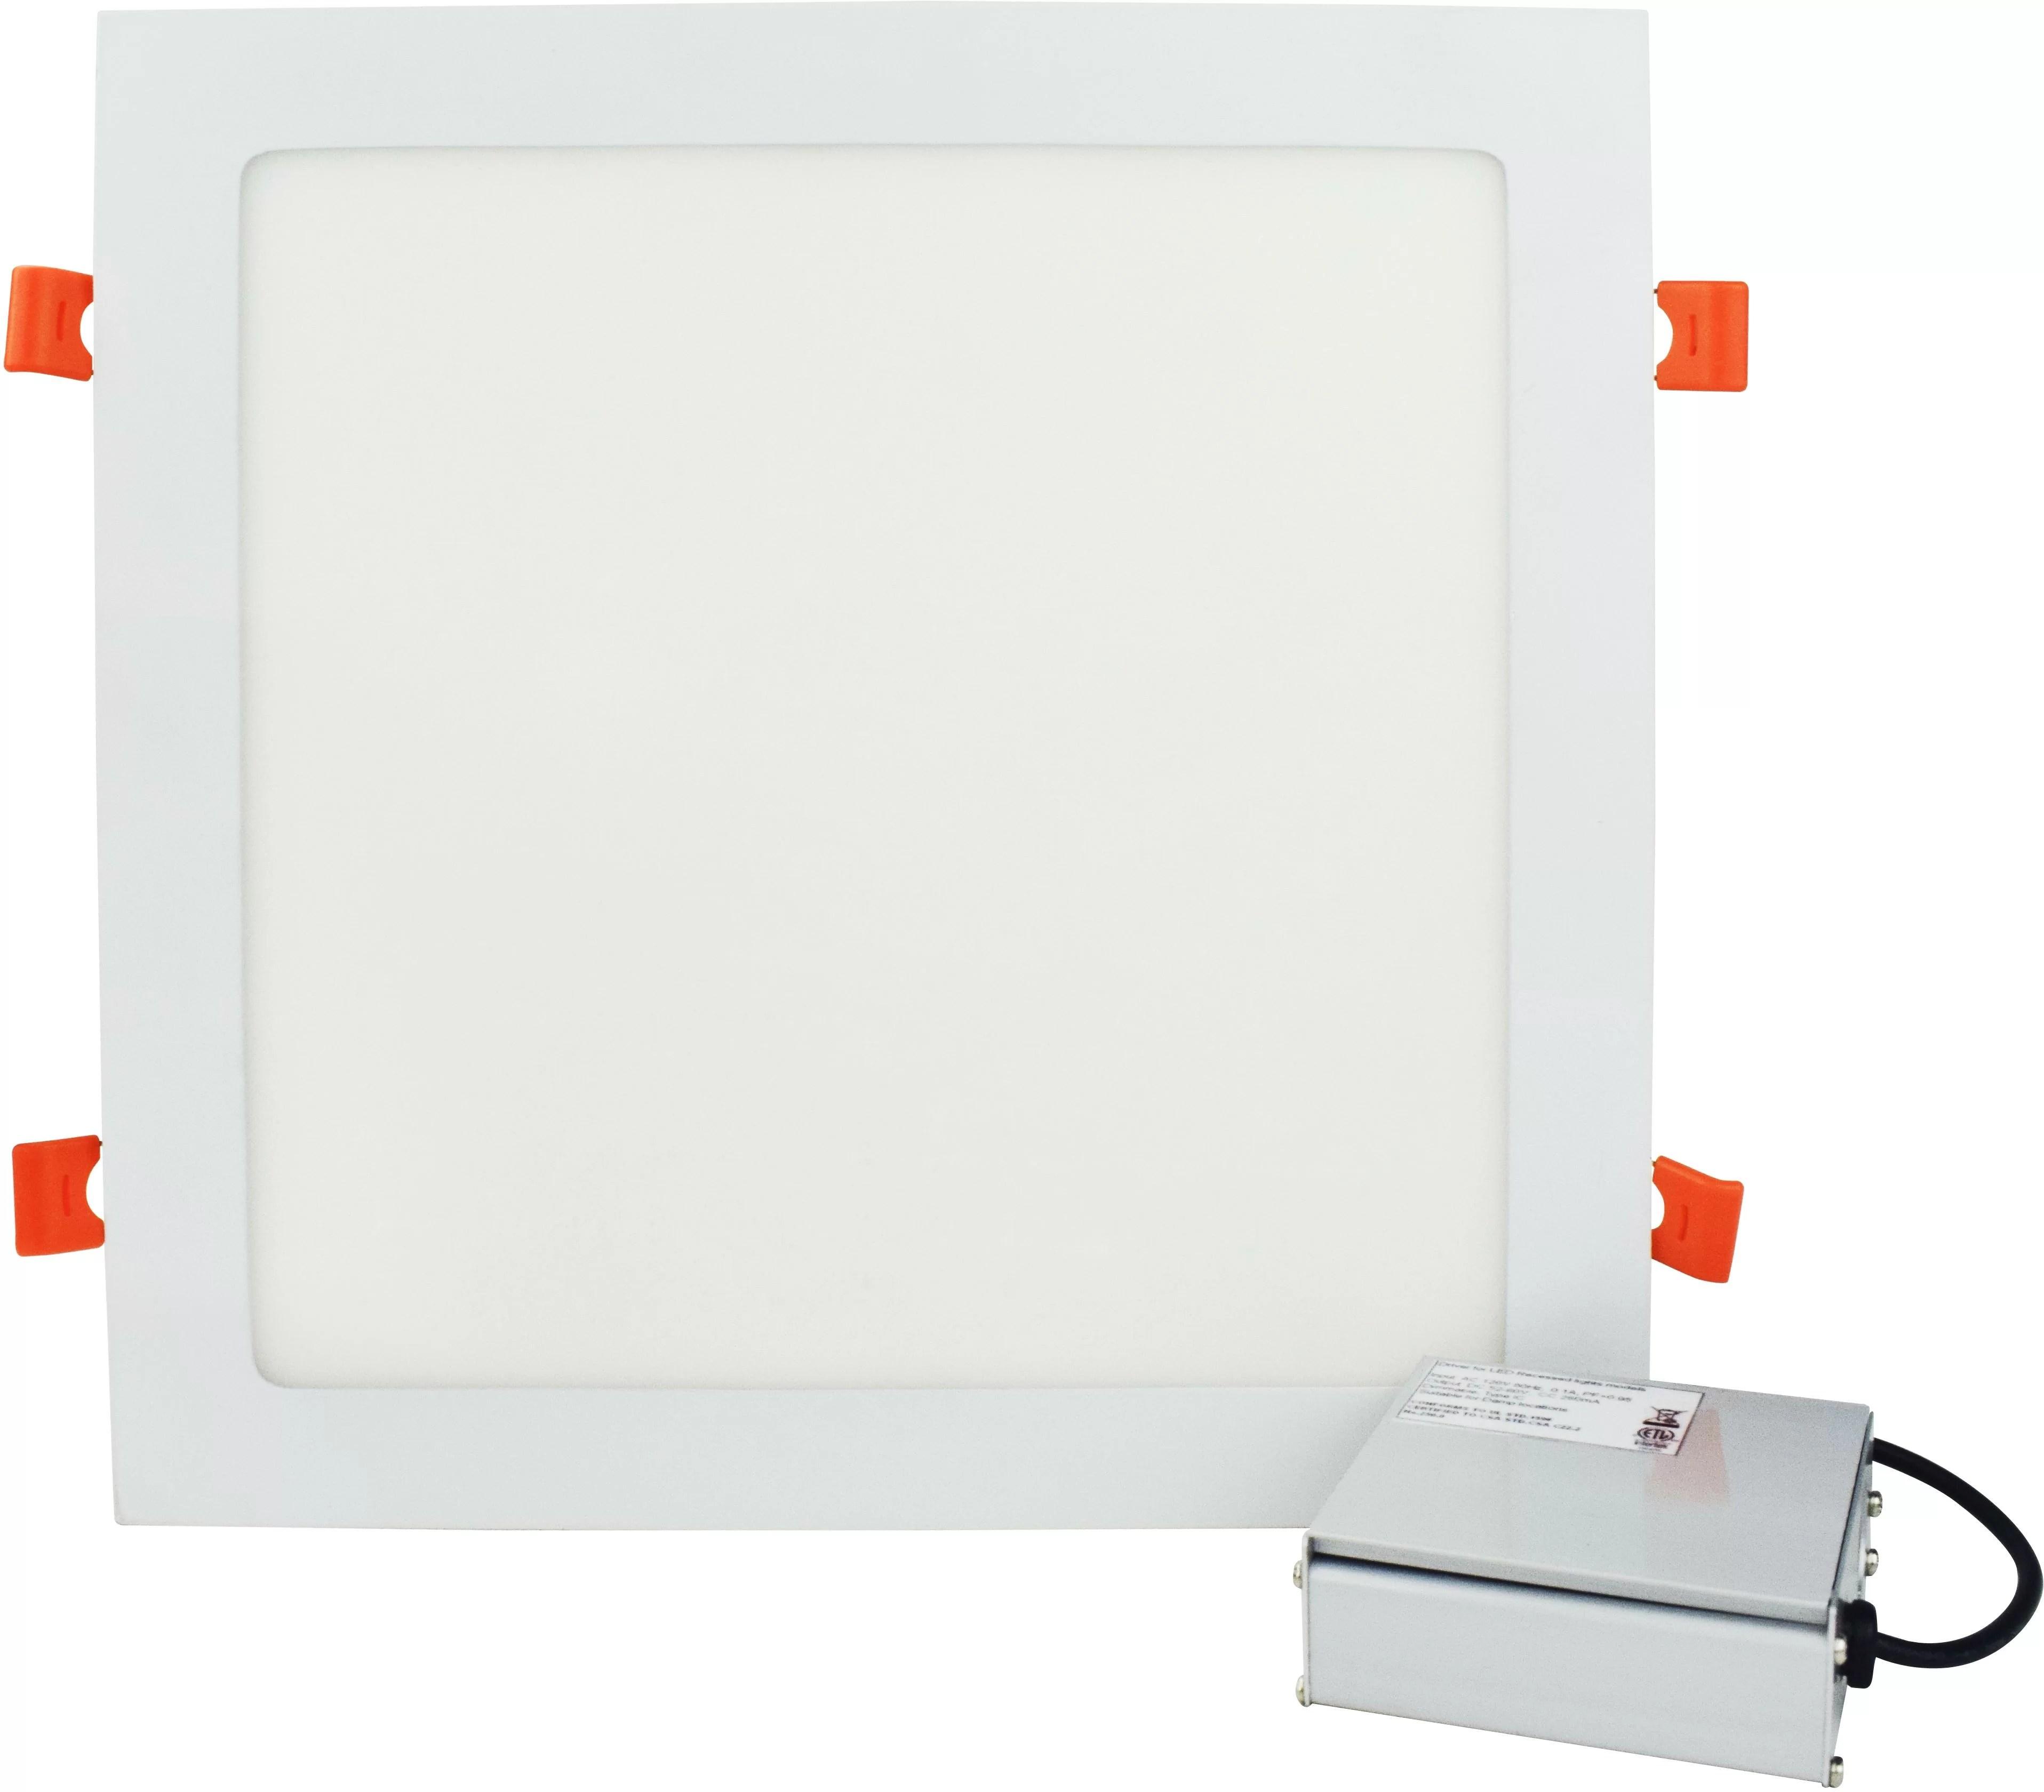 12 remodel led retrofit recessed lighting kit